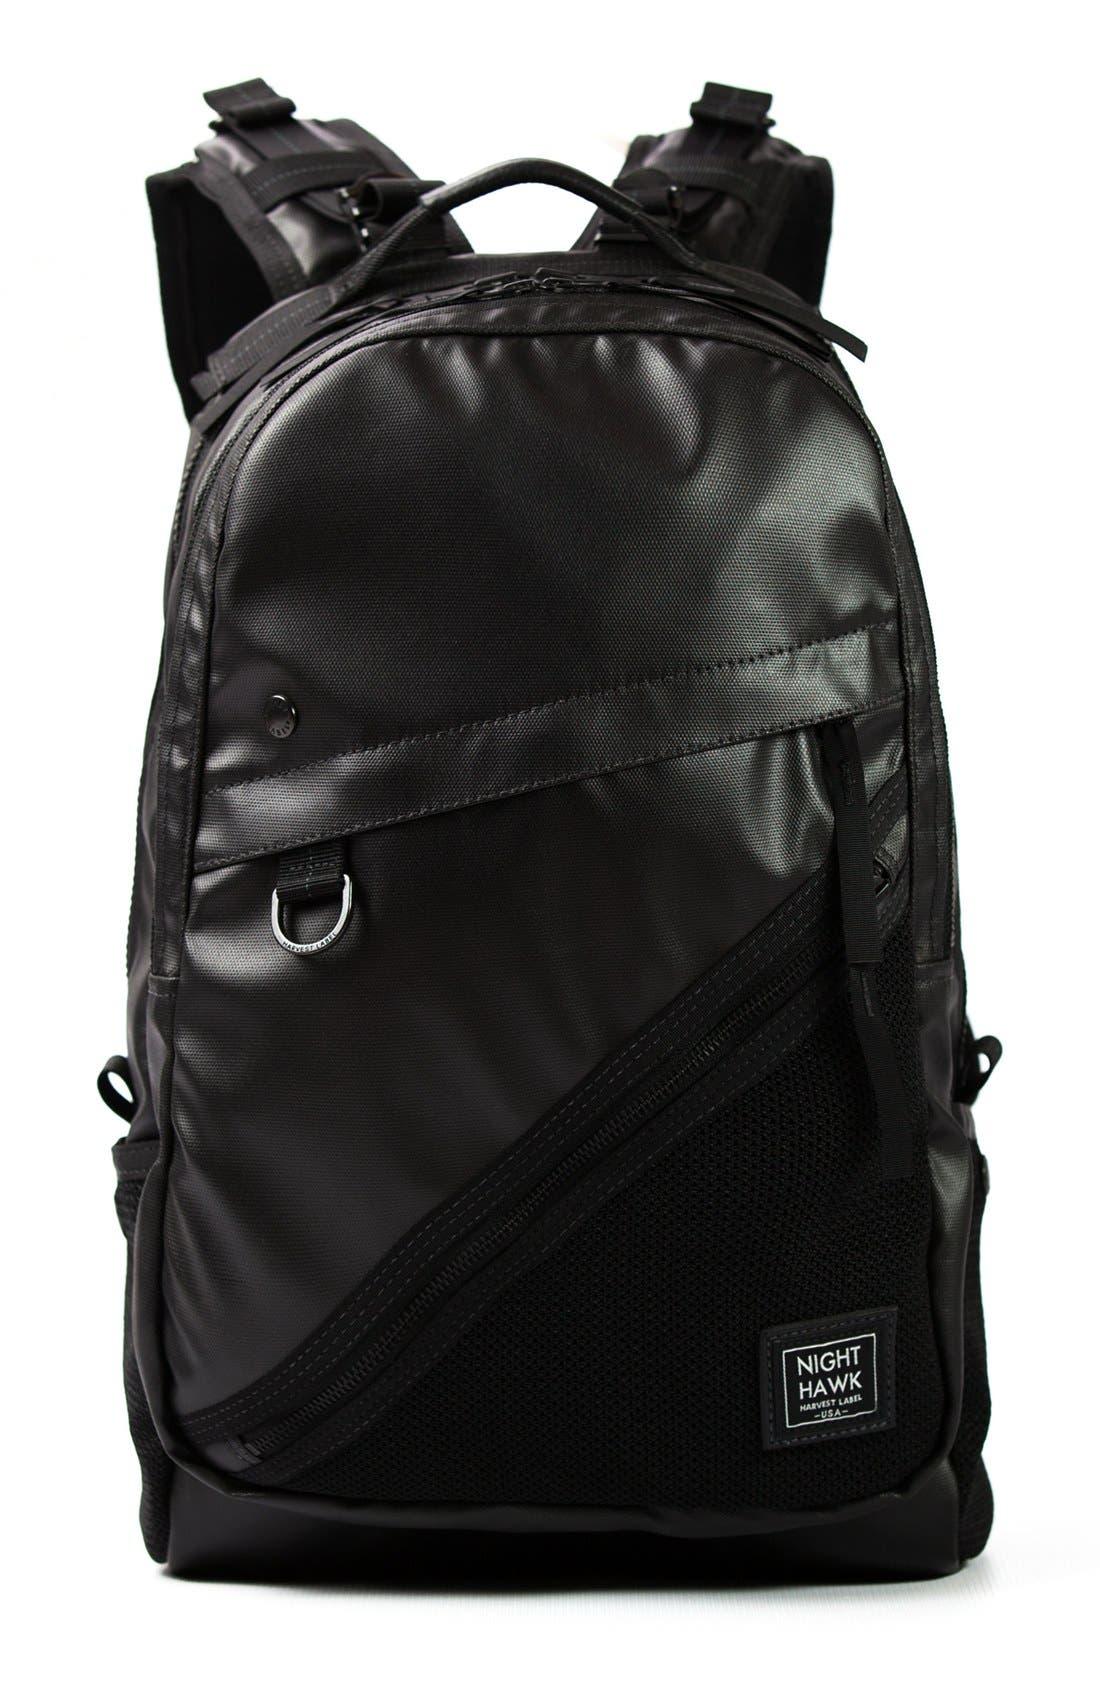 'NightHawk' Backpack,                             Main thumbnail 1, color,                             BLACK